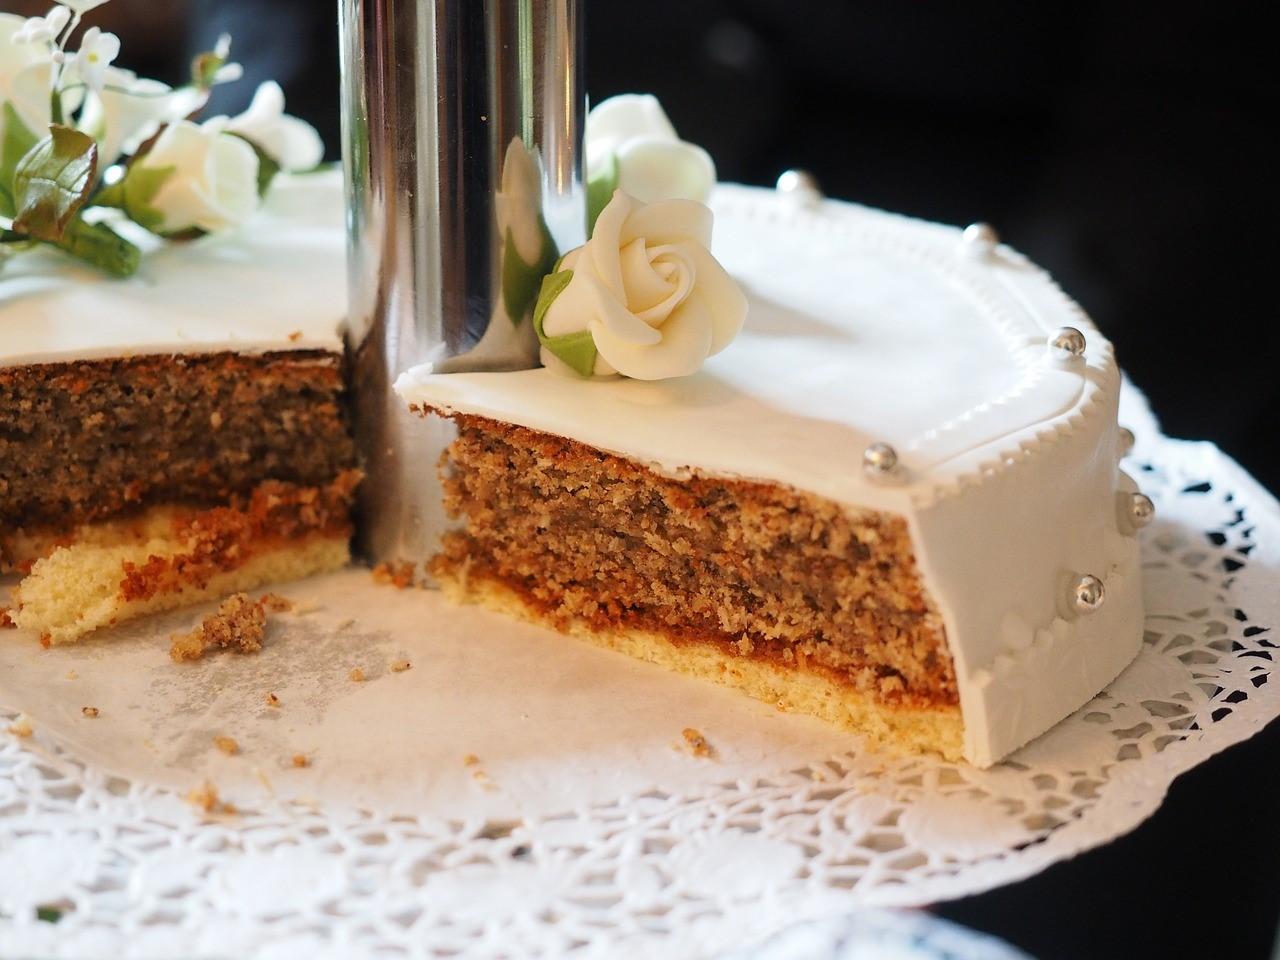 Sending your wedding cake abroad